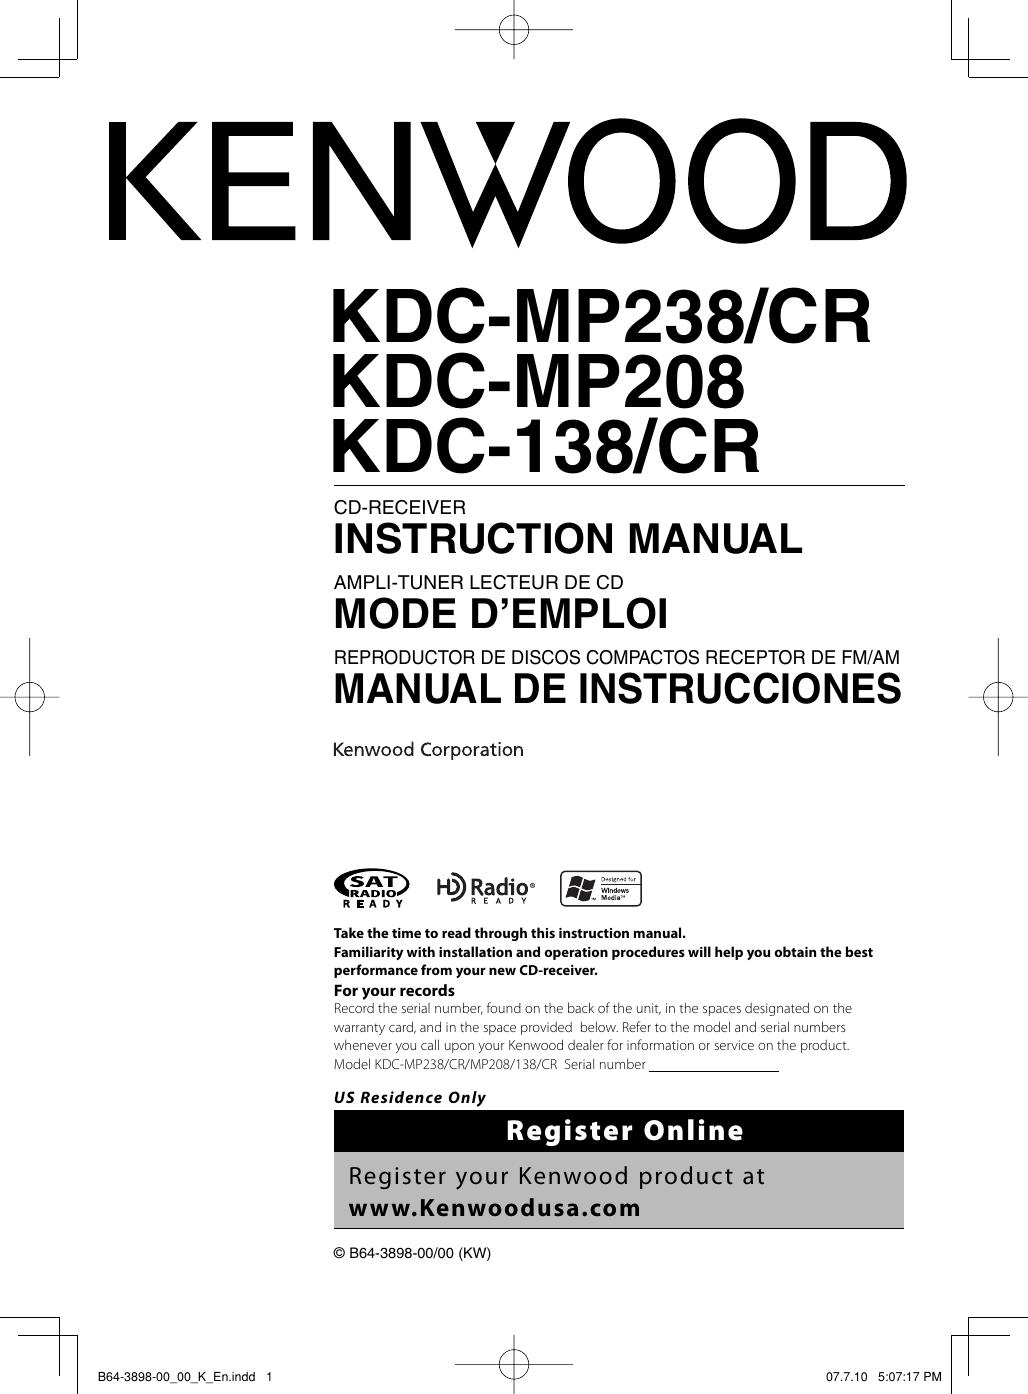 [SCHEMATICS_4US]  798A3 Kenwood Kdc Mp208 Wiring Diagram | Wiring Library | Kenwood Kdc Mp208 Wiring Diagram |  | Wiring Library